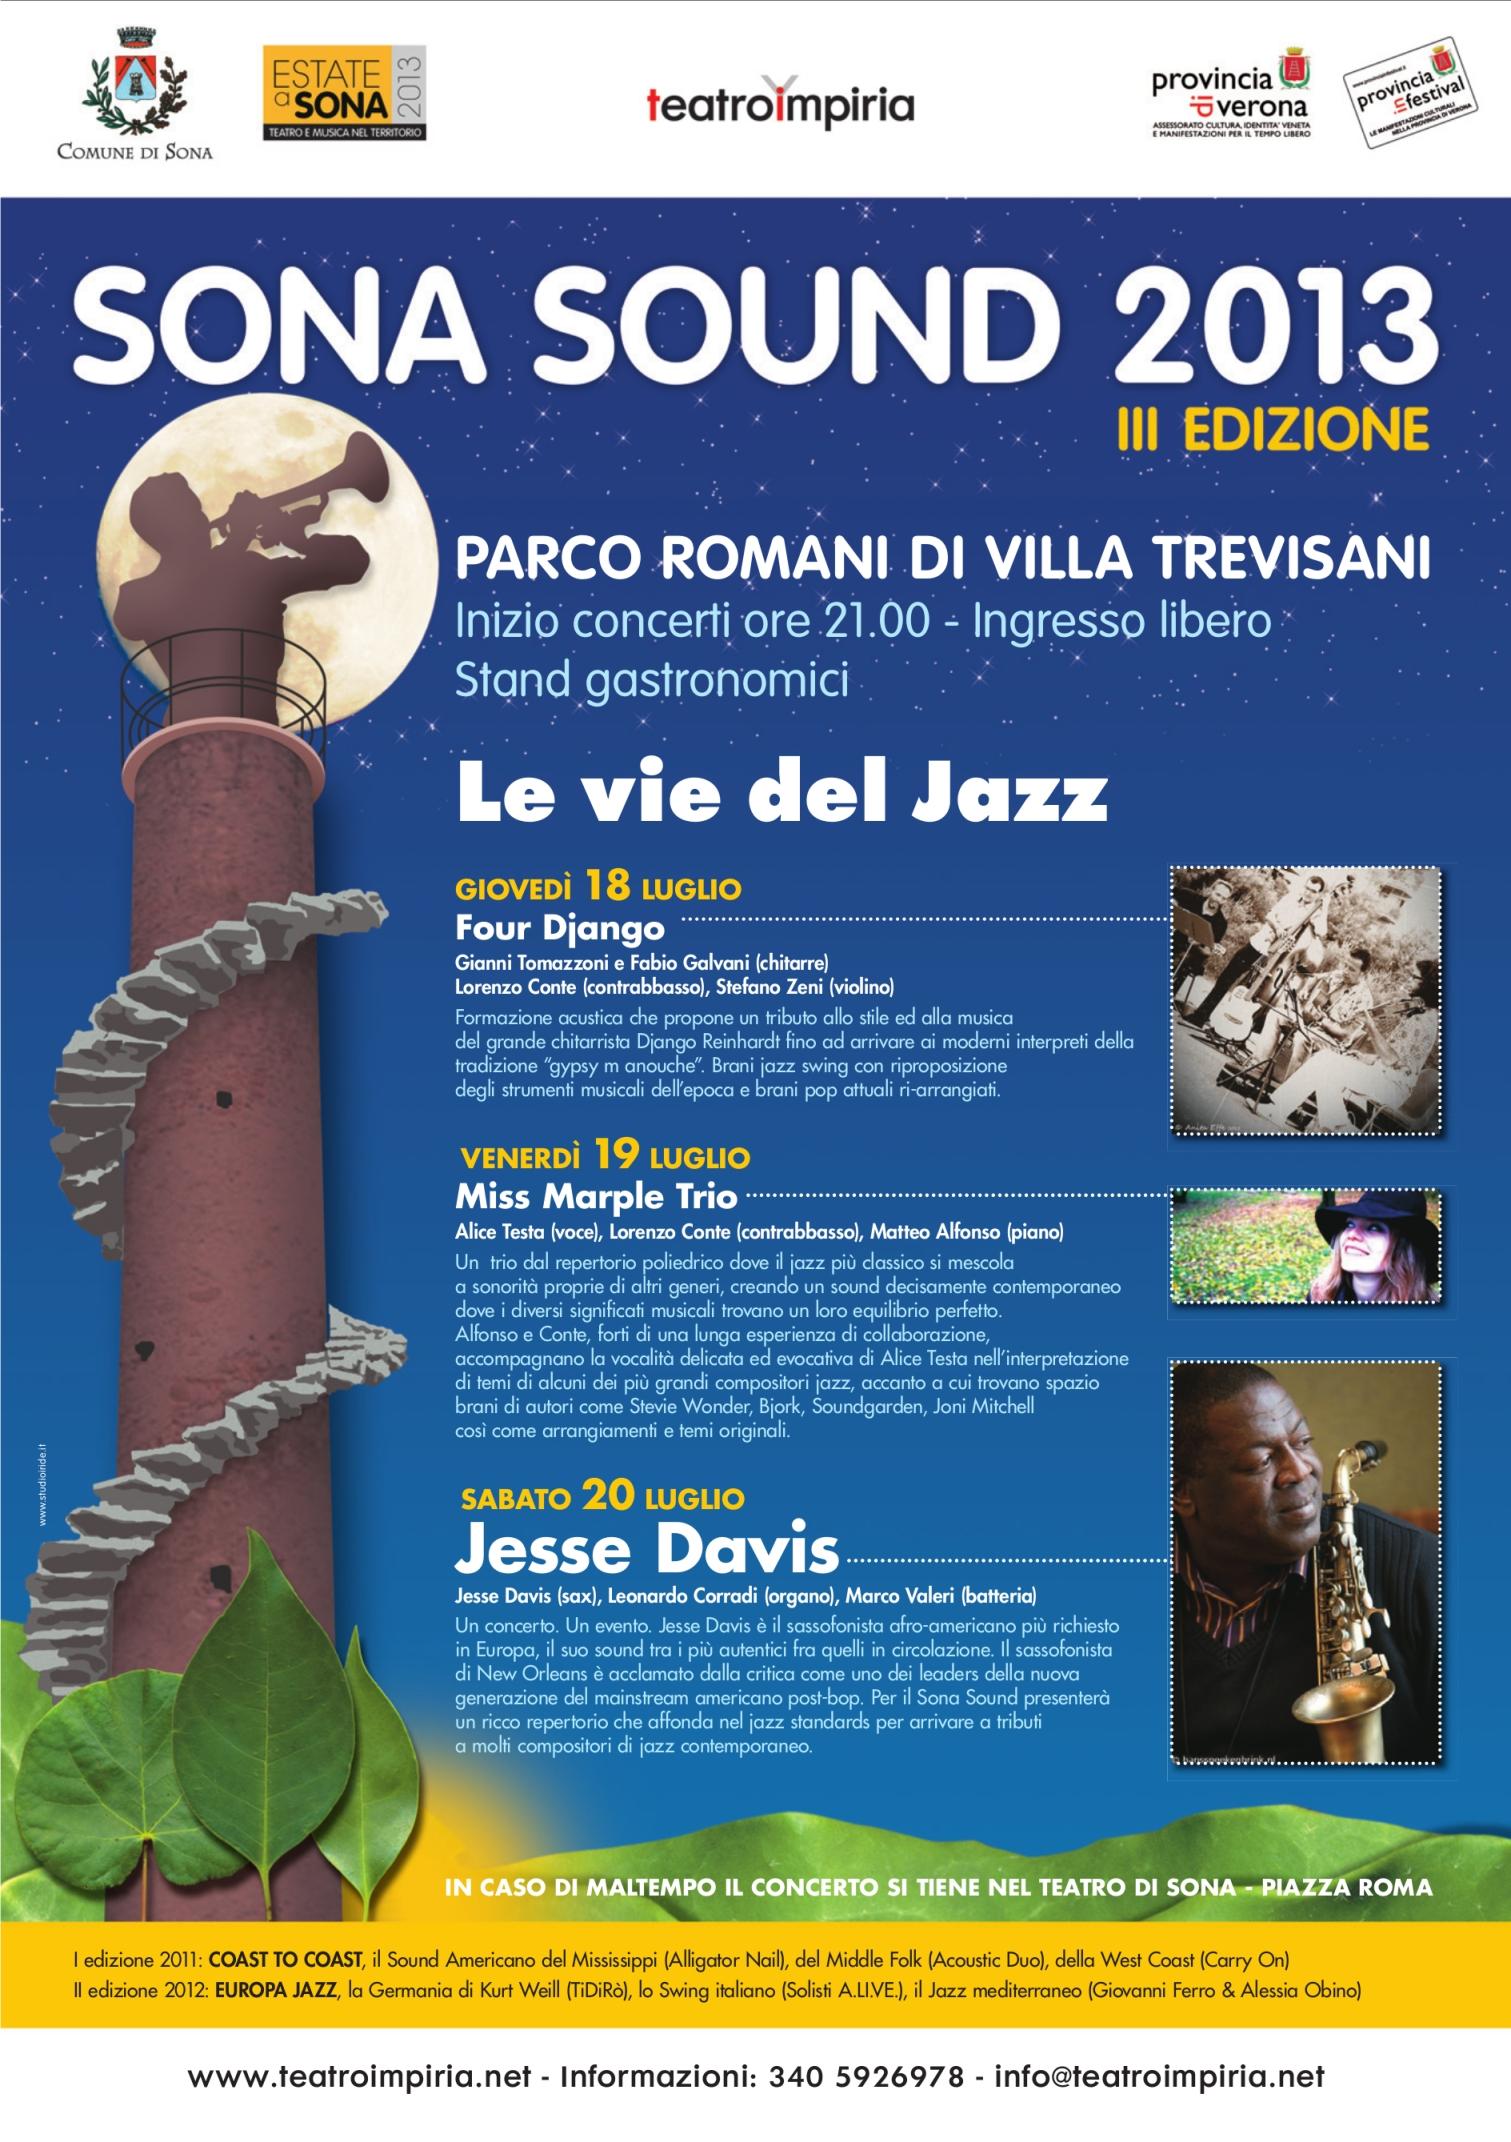 sona-sound-music-jazz-impiria-verona-castelletti